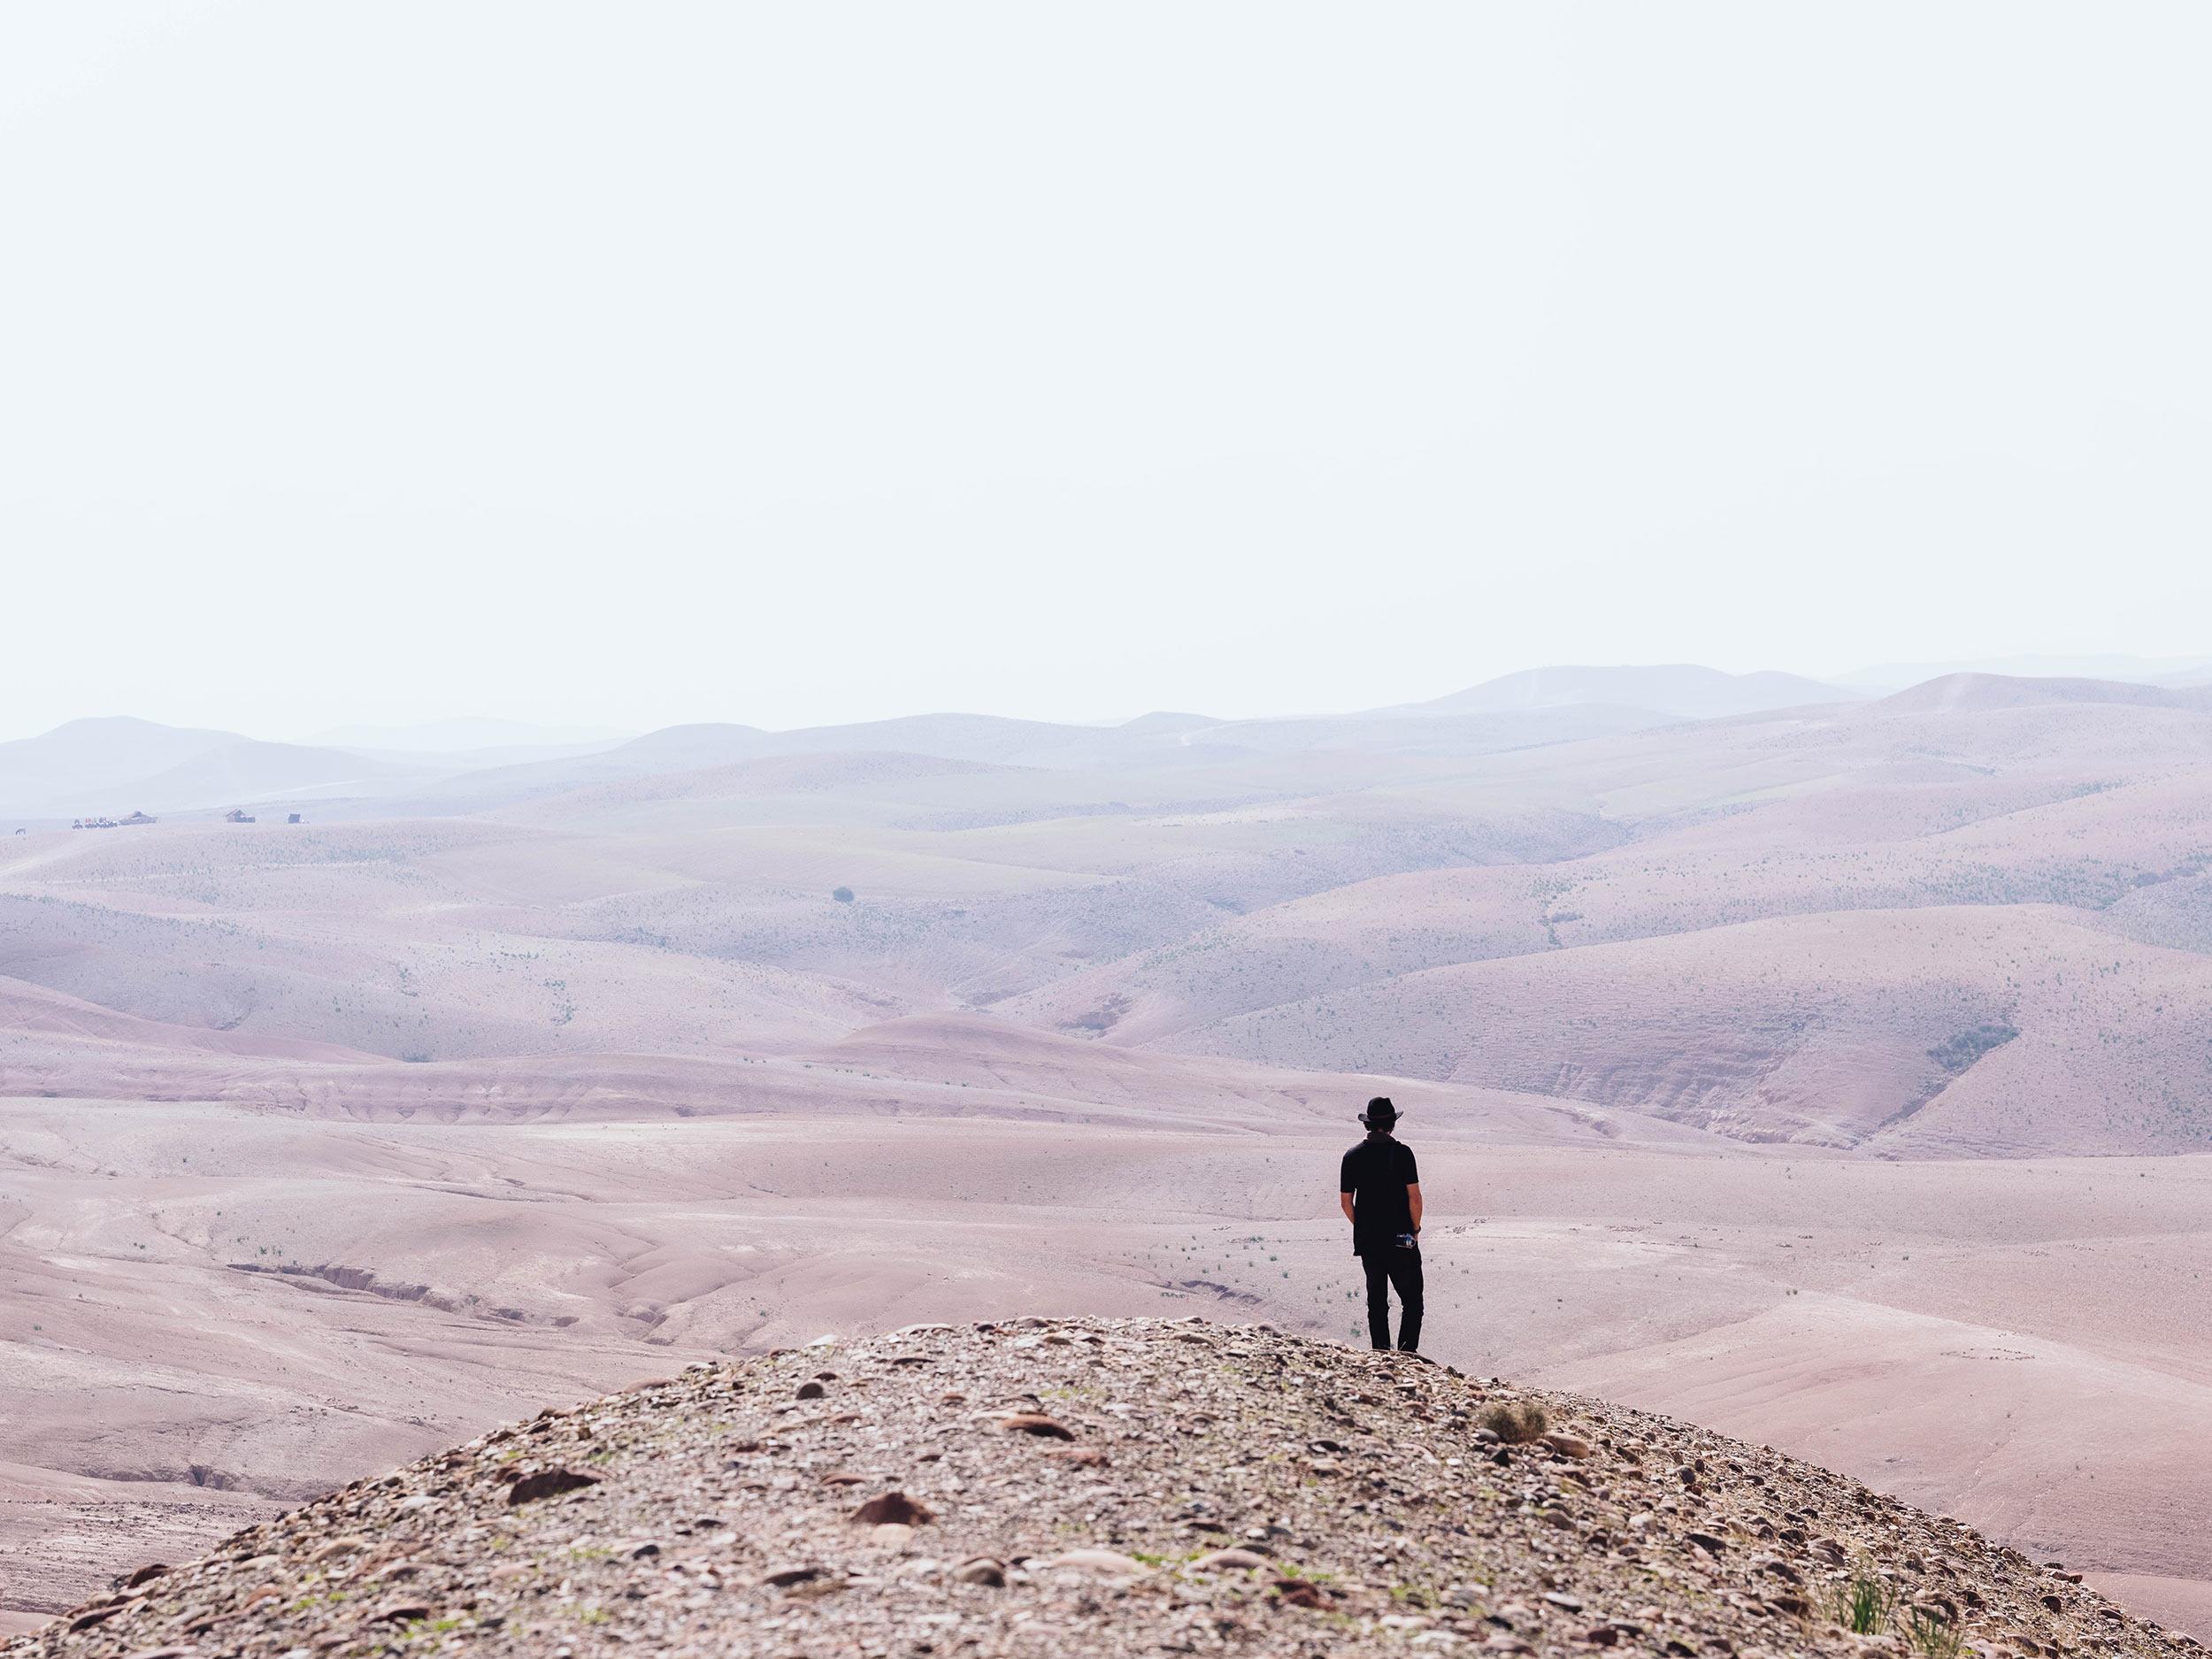 Morocco-08170.jpg